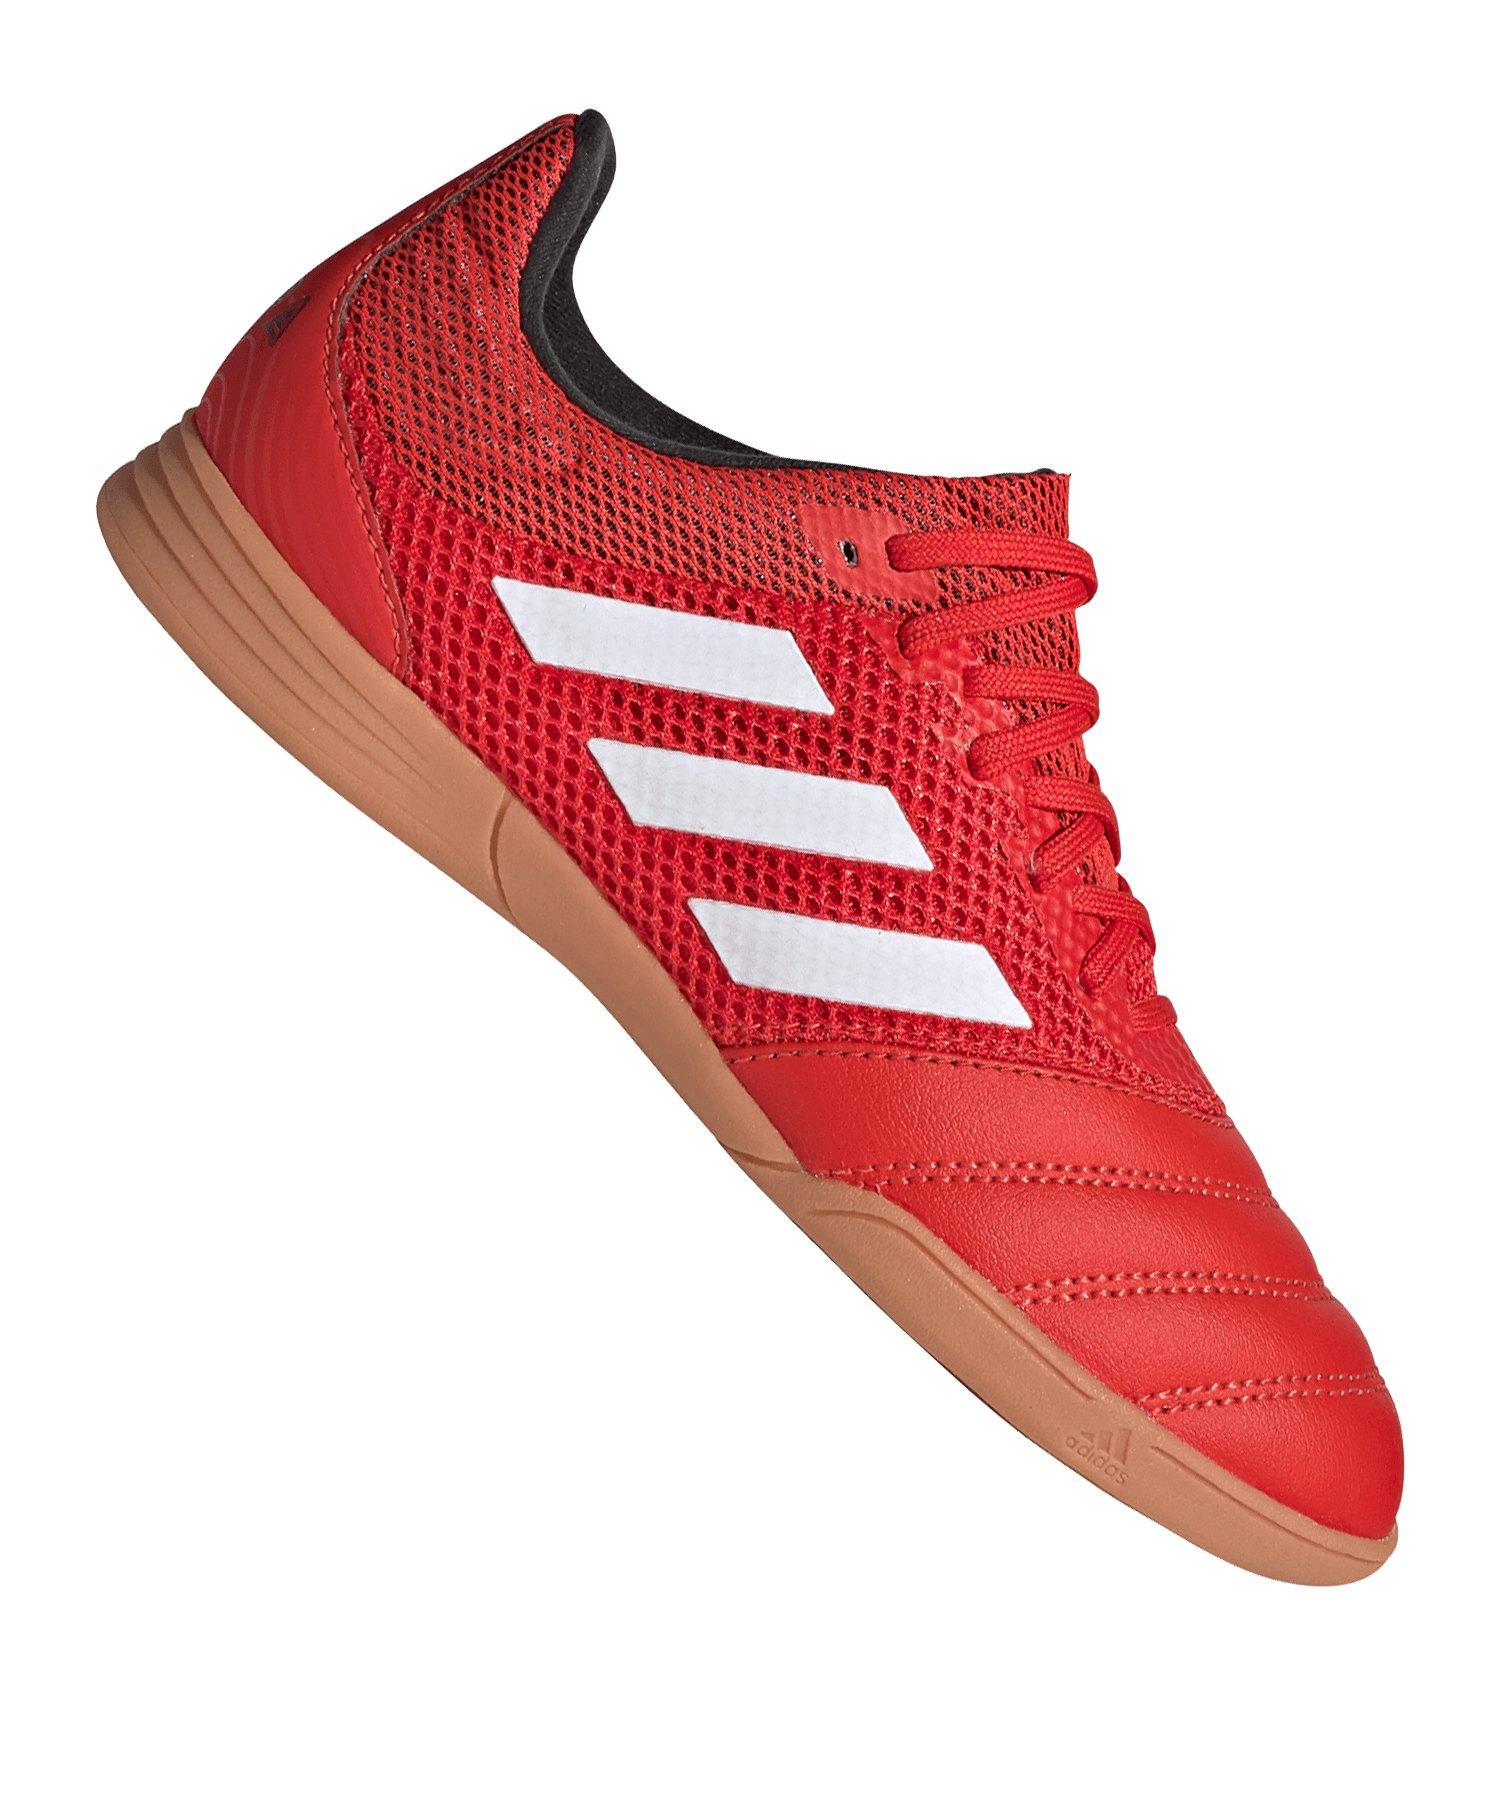 adidas COPA 20.3 IN Sala Halle J Kids Rot Schwarz - rot